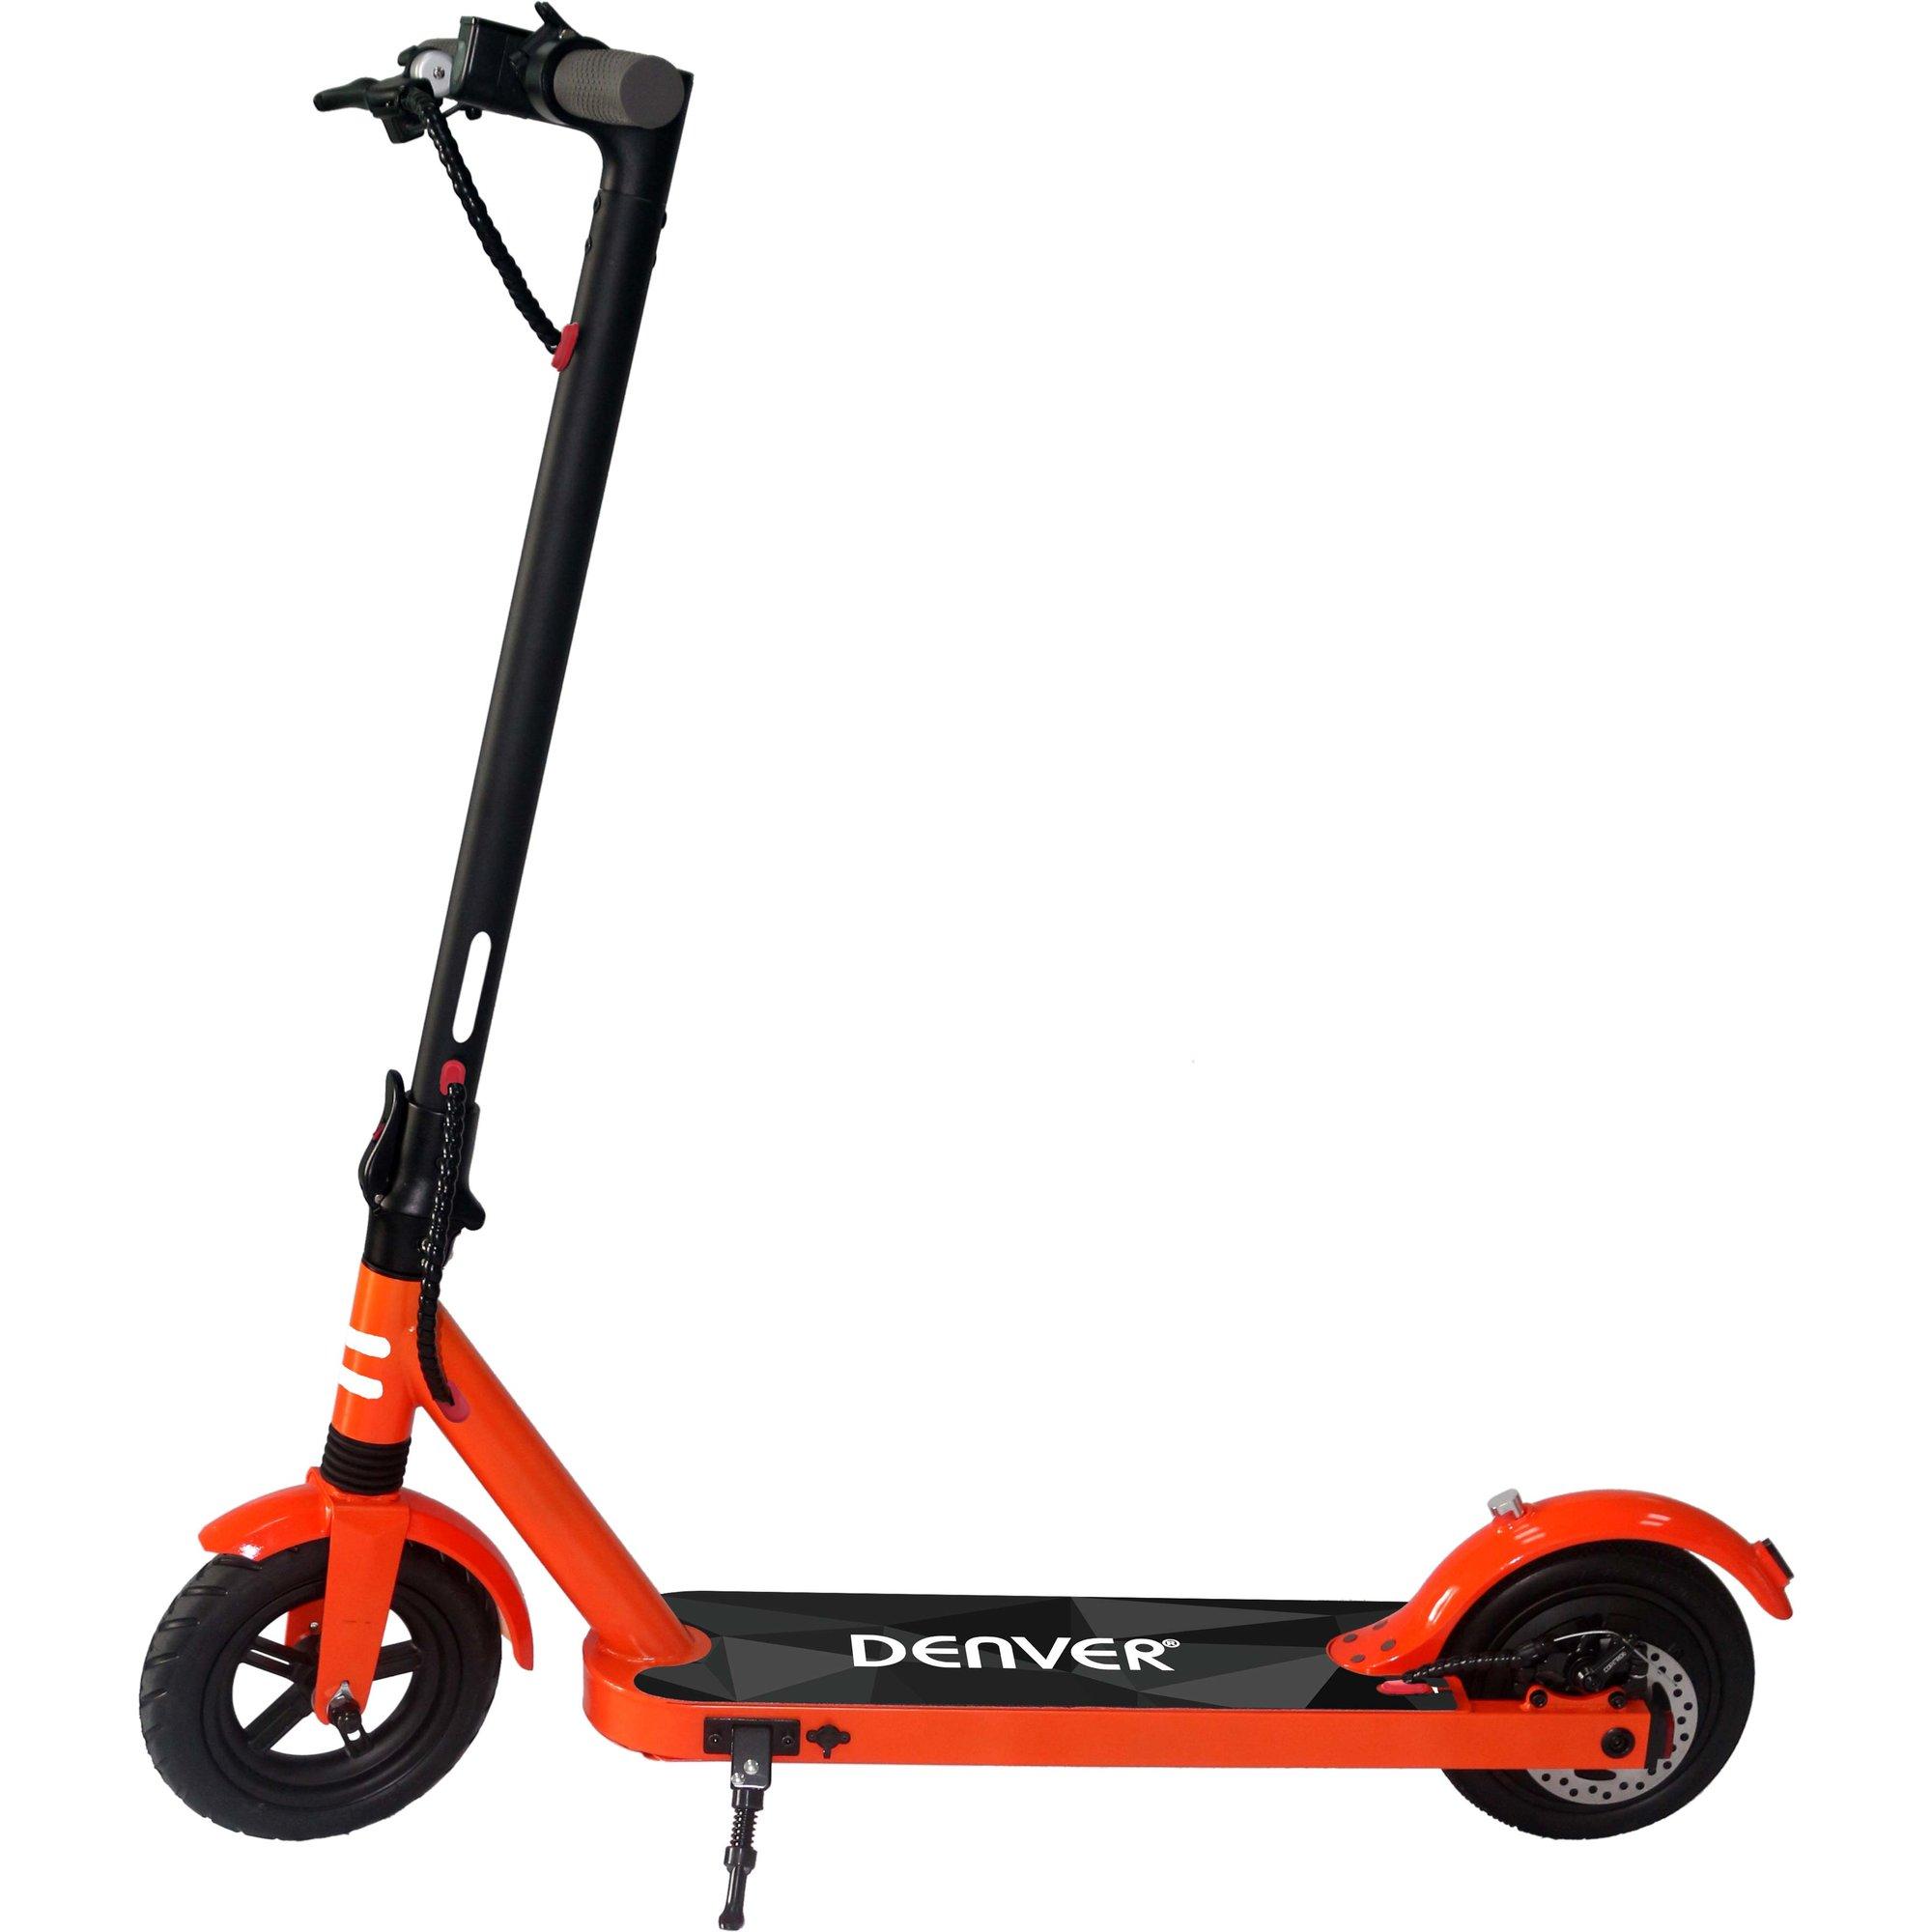 Denver SCO-85350 elektrisk scooter orange